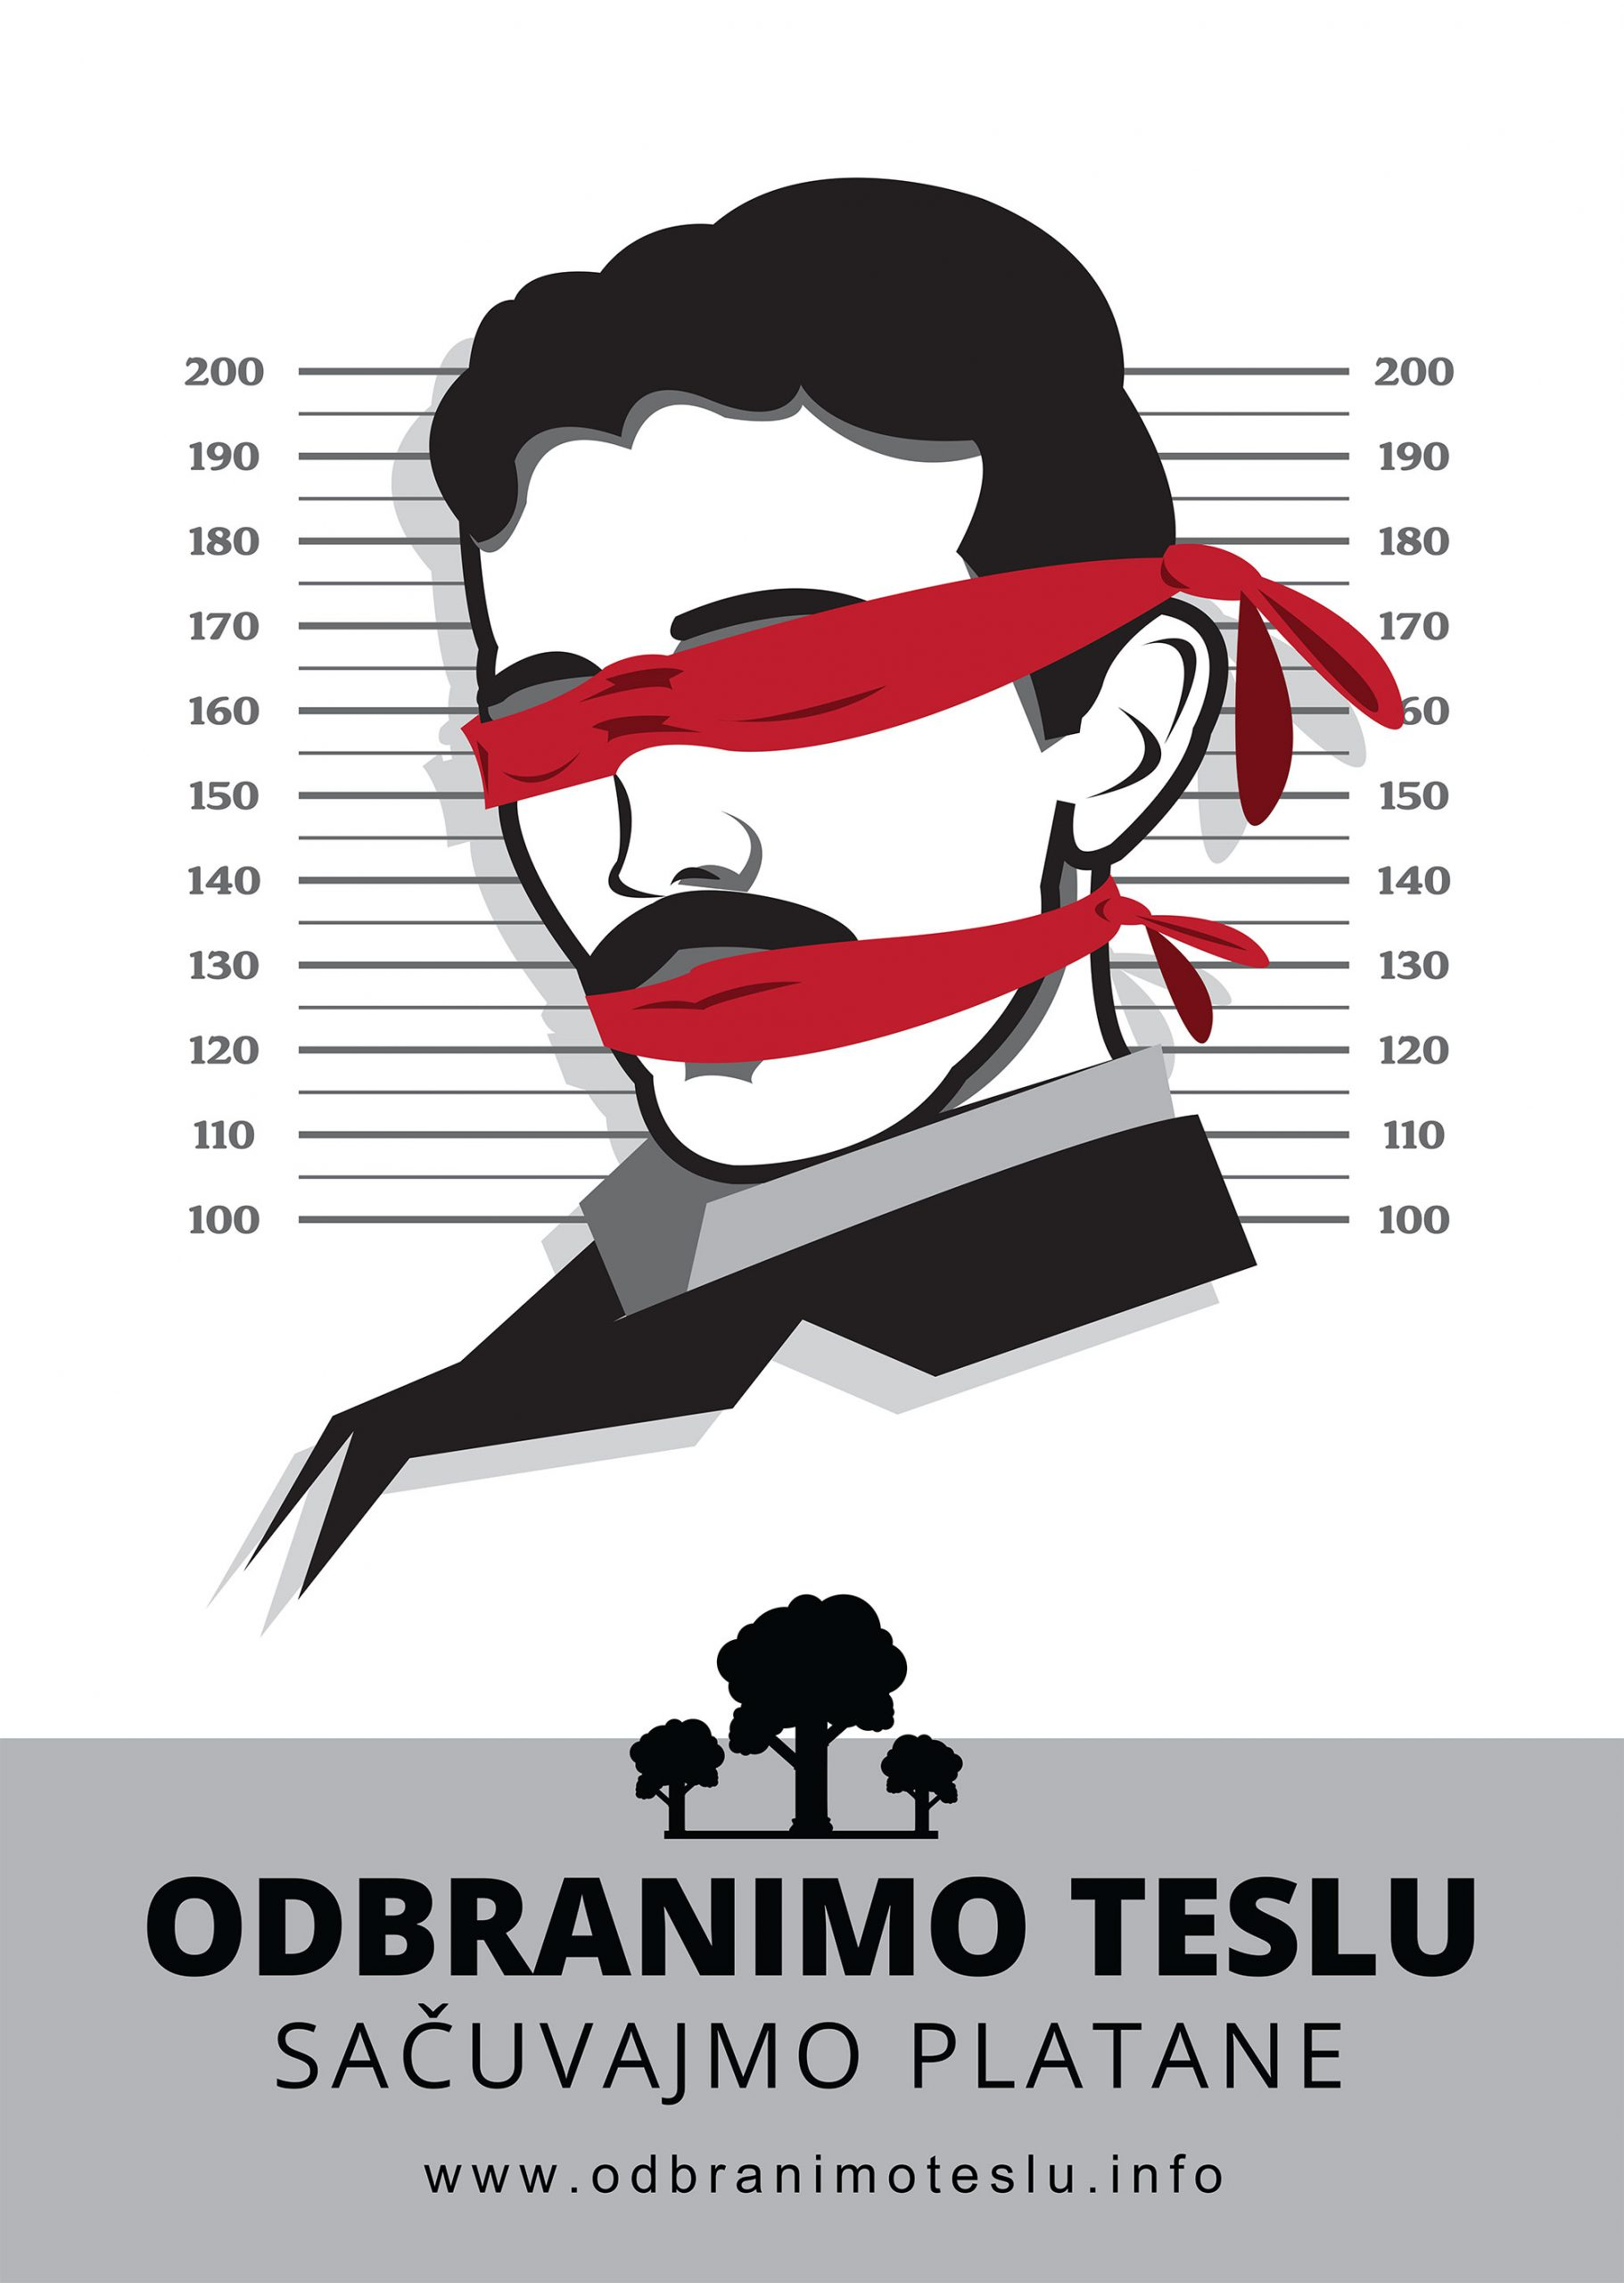 Odbranimo Teslu plakat